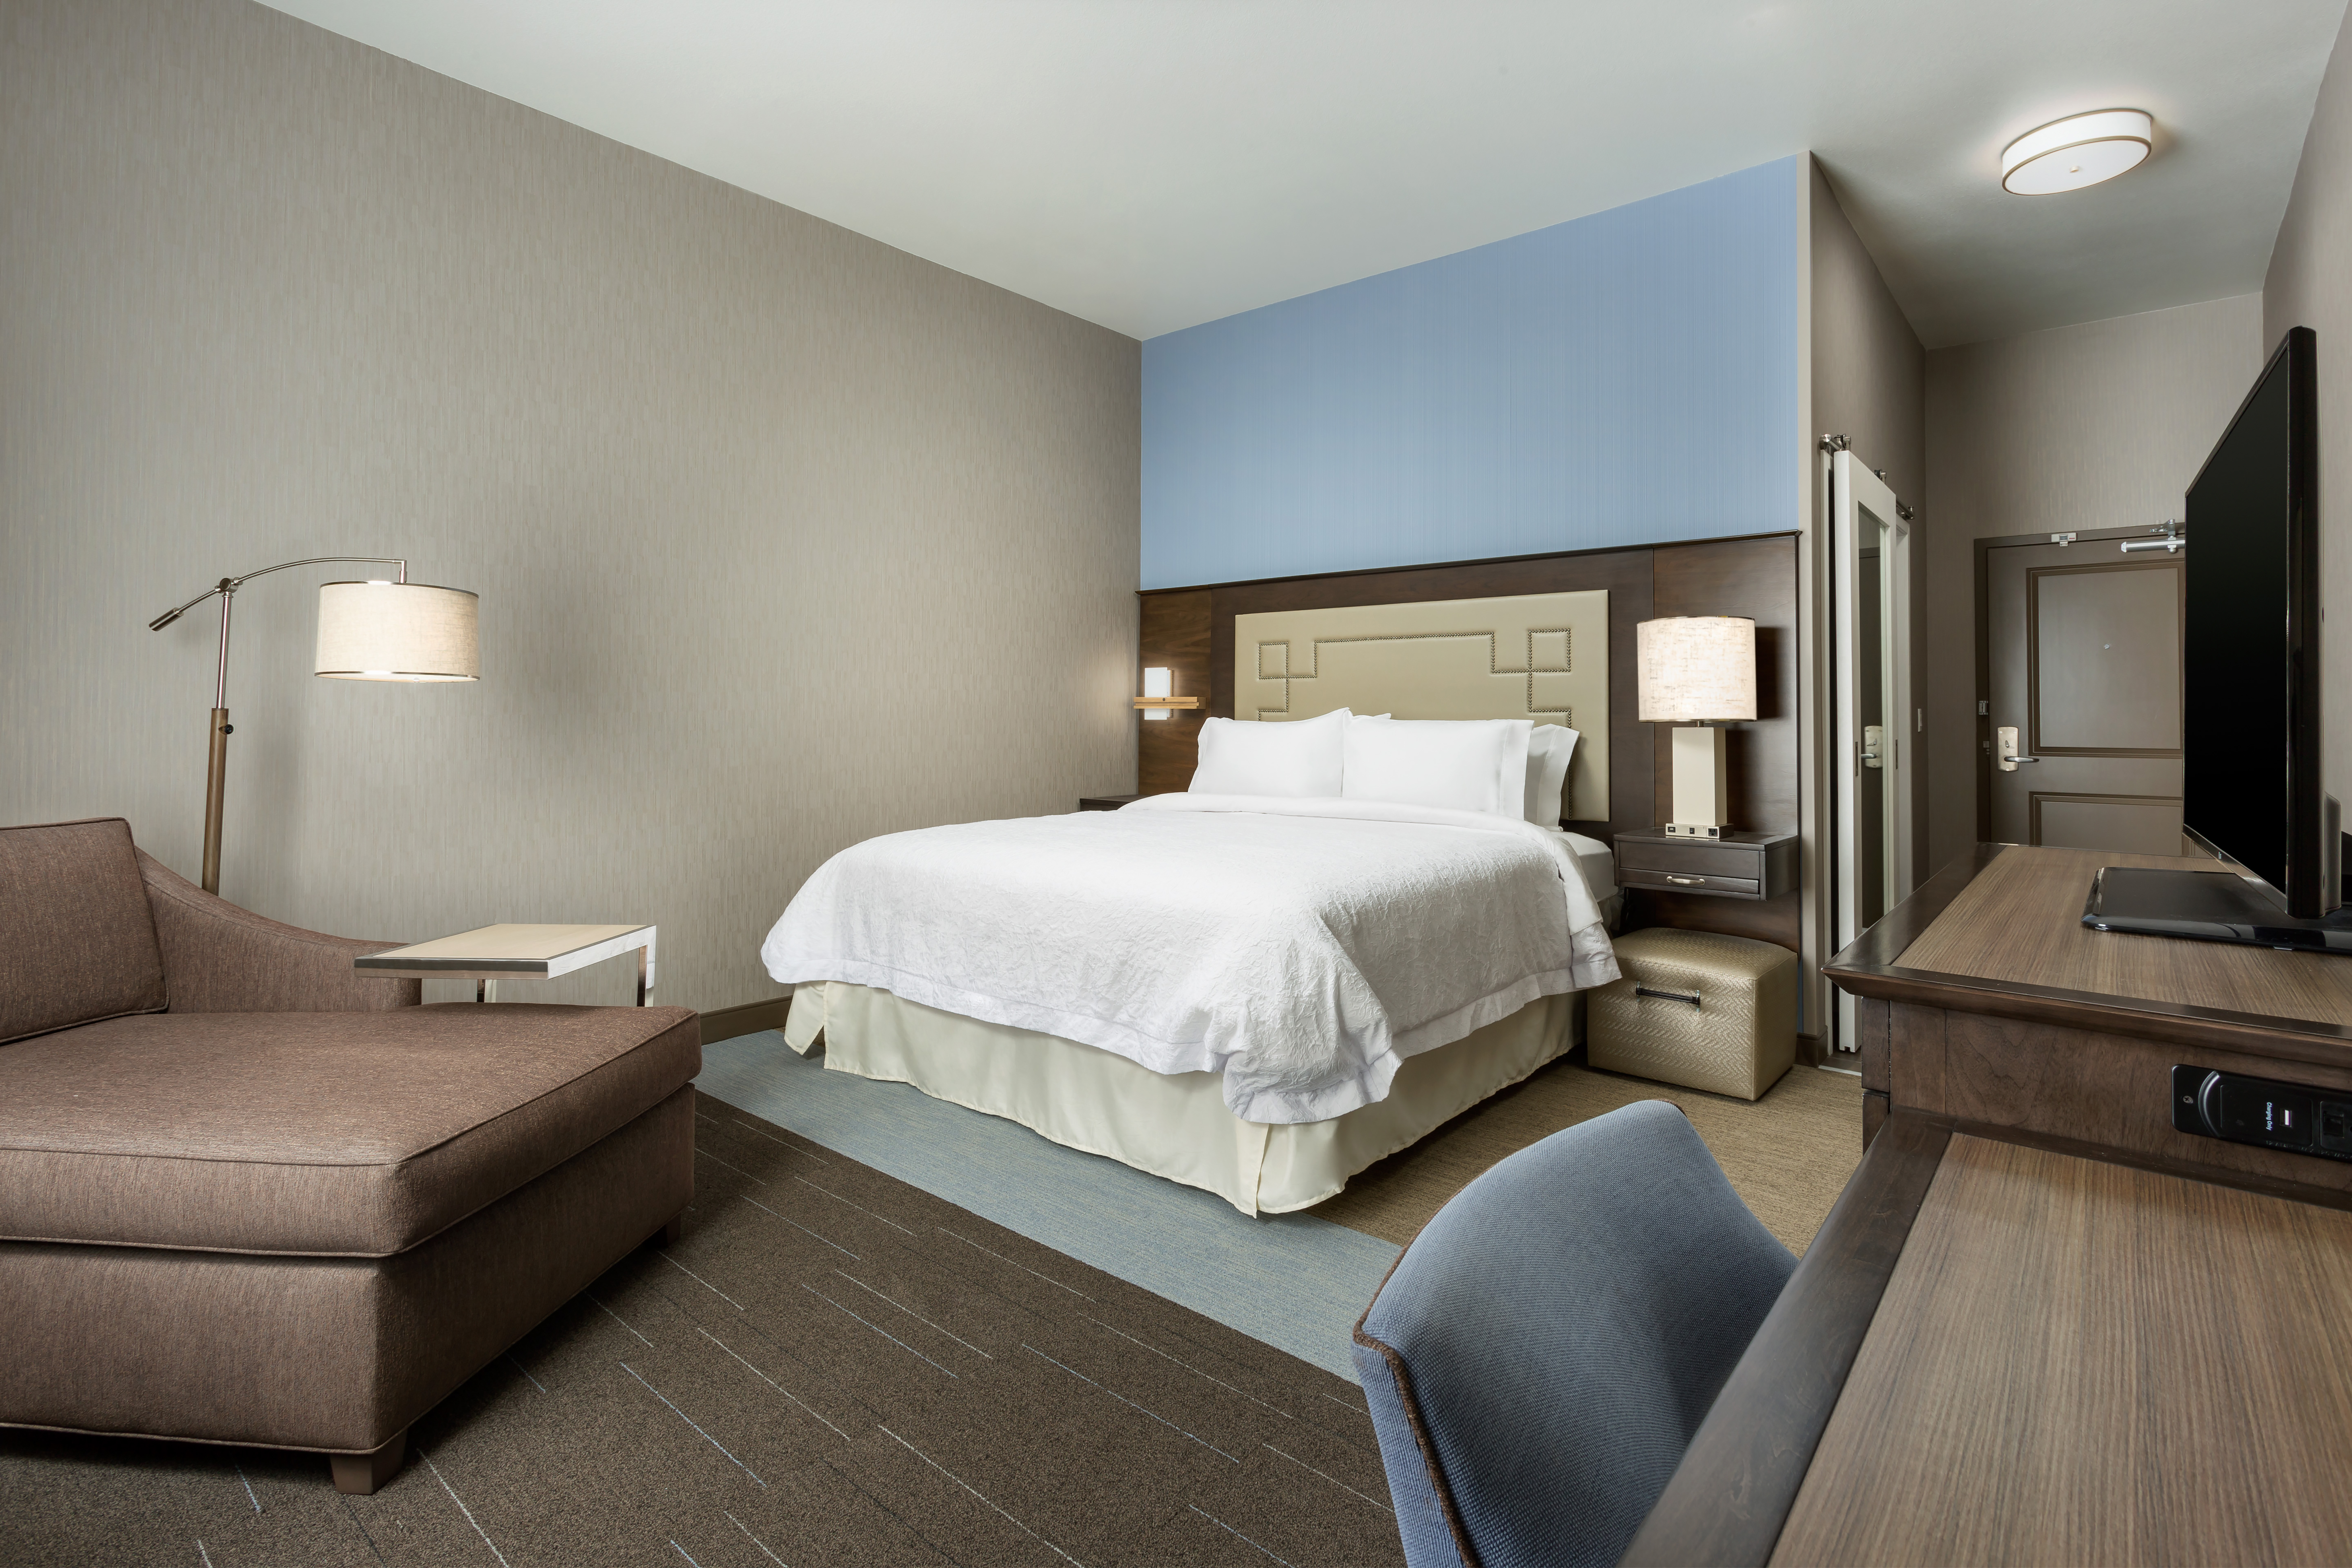 Hampton Inn & Suites Napa   Napa, CA 94559 on